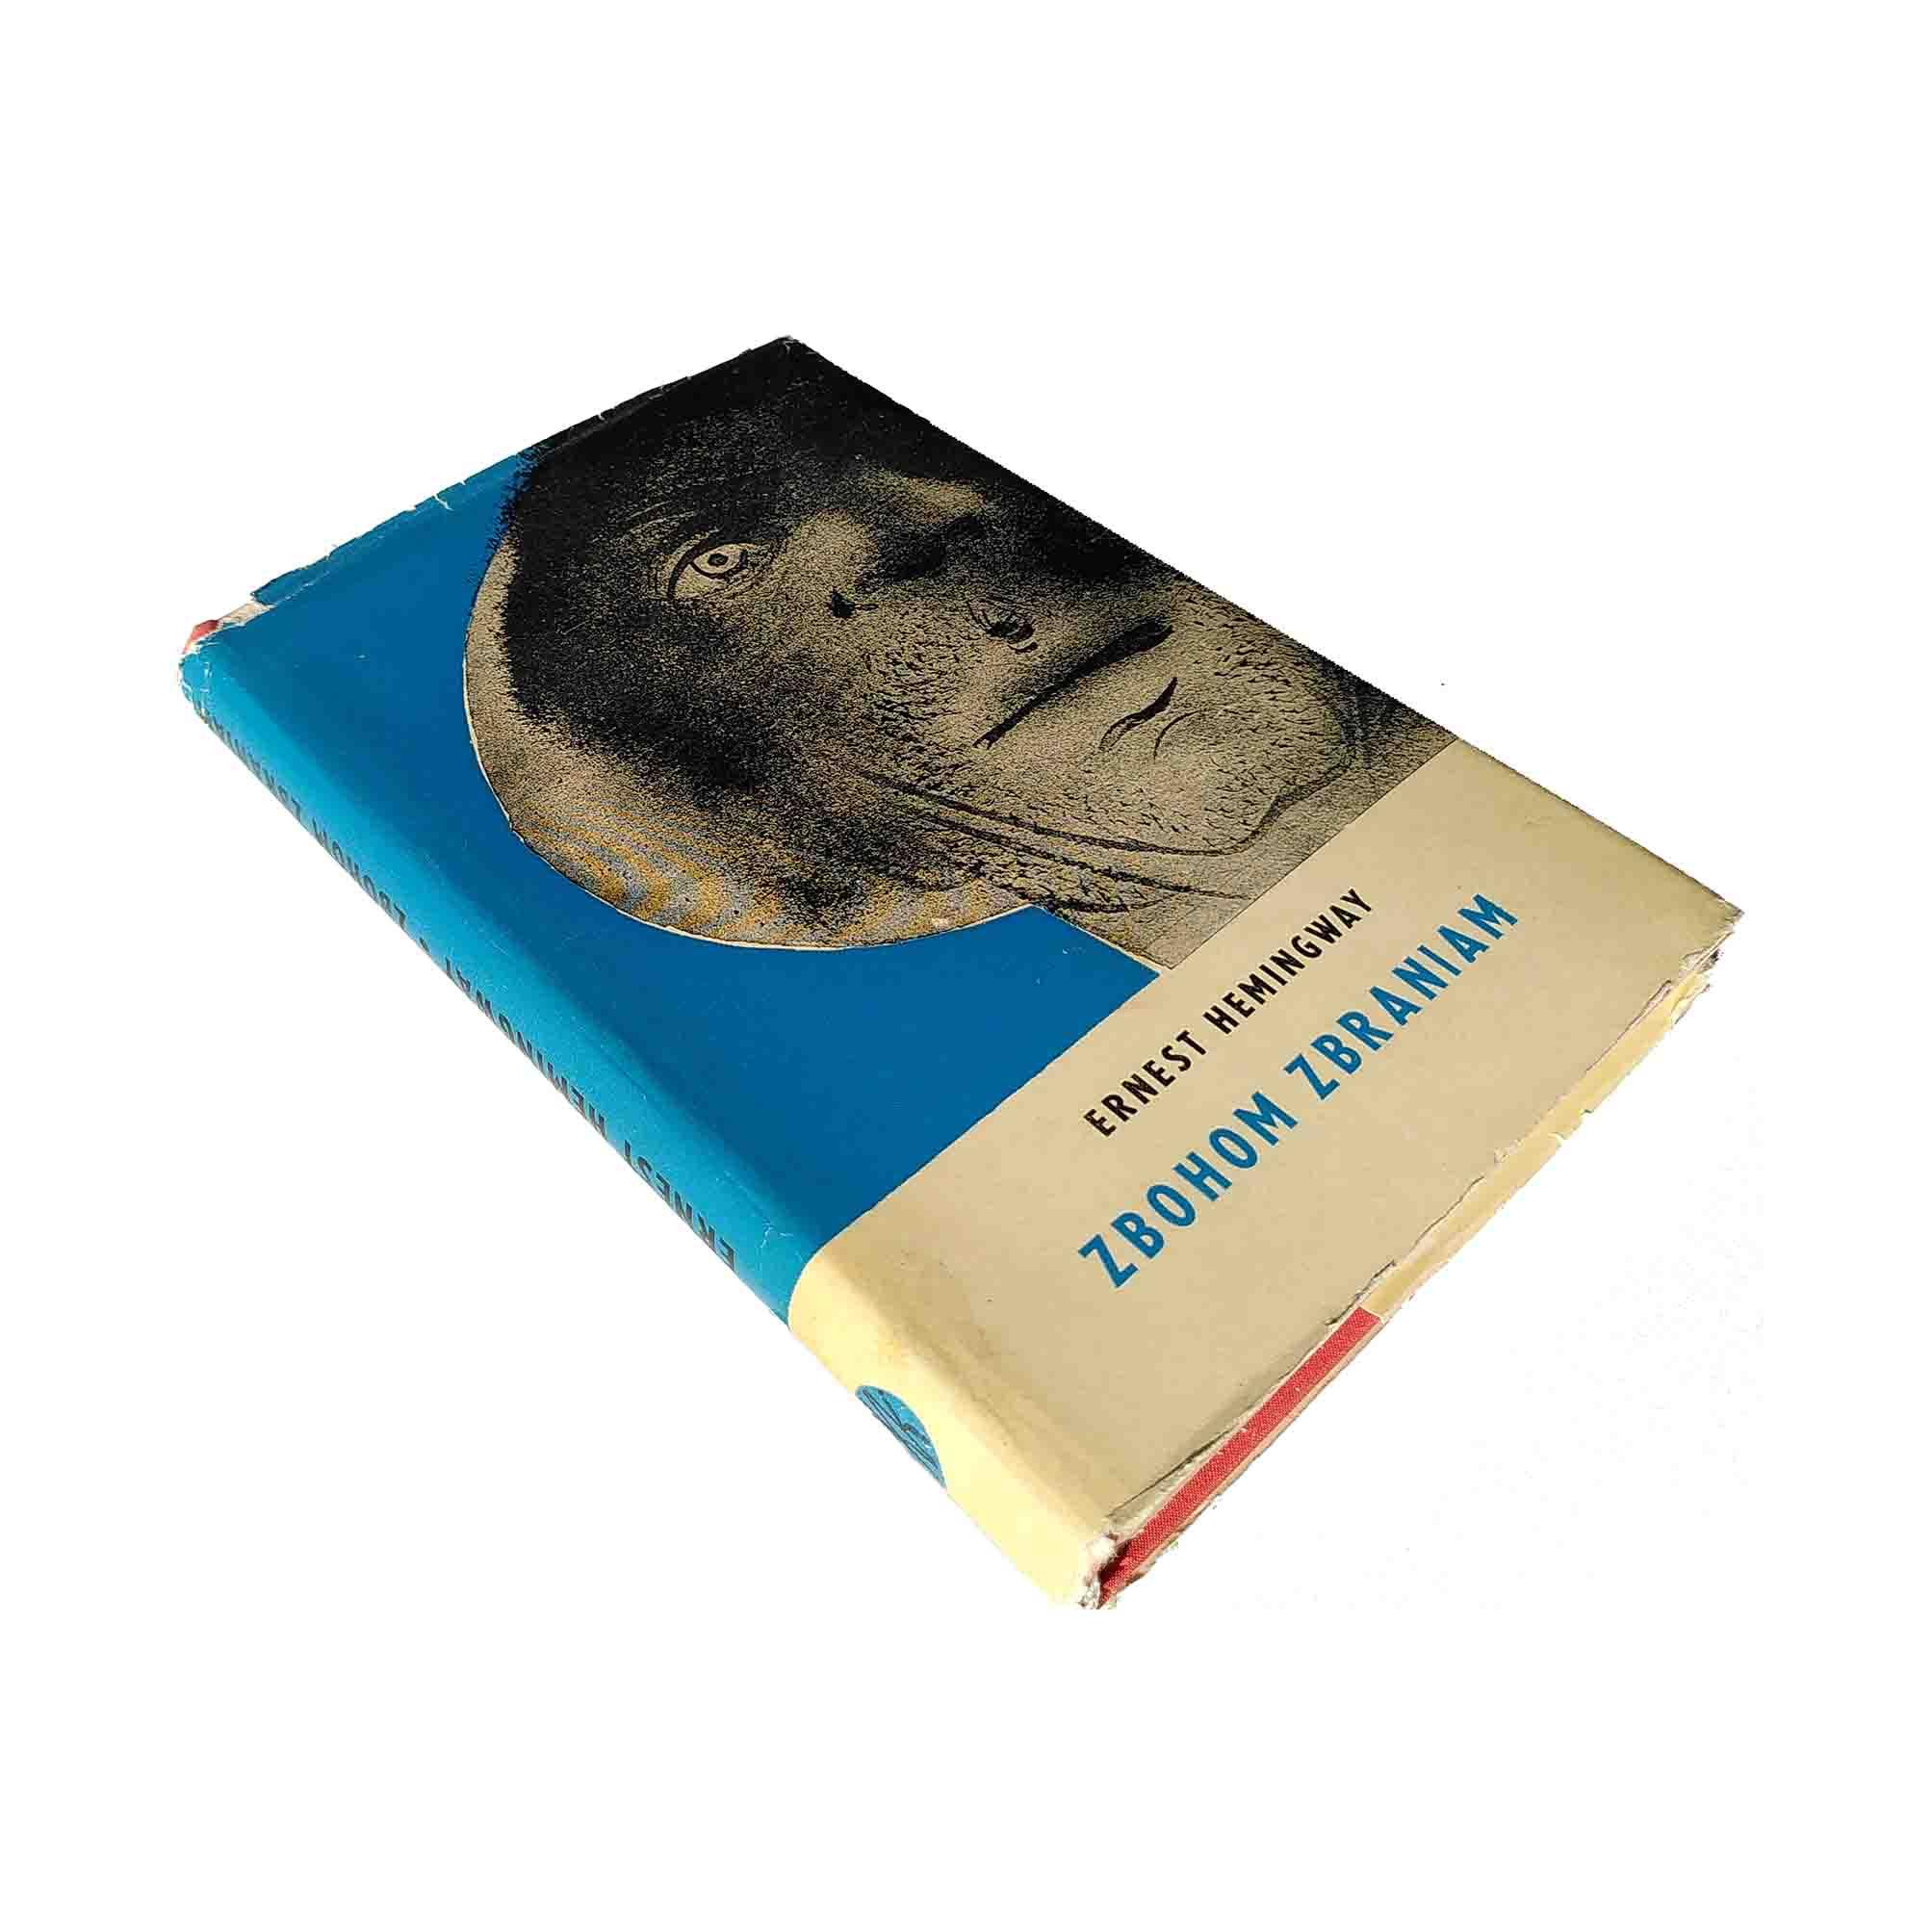 5914 Hemingway Farwell Slovak First Edition 1964 Dust Jacket free N